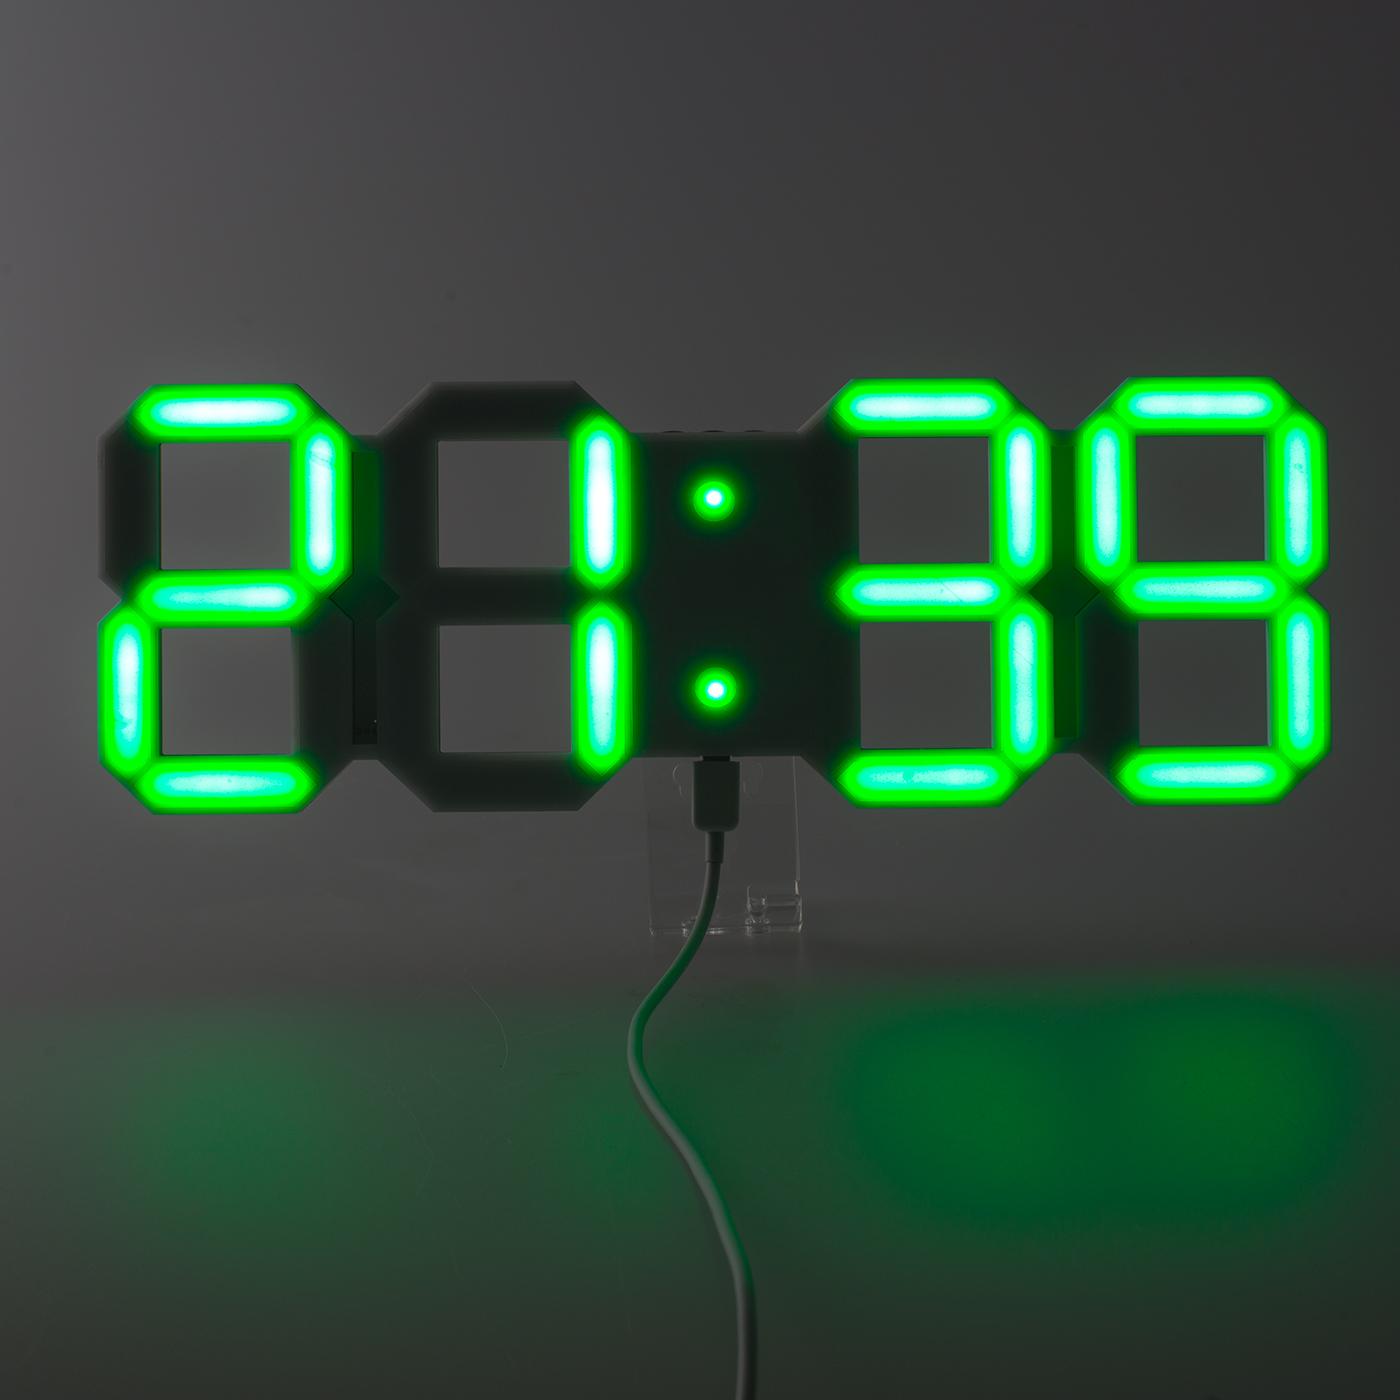 digitale led wanduhr uhr leuchtuhr in 4 farben b ro wartezimmer digital aus de ebay. Black Bedroom Furniture Sets. Home Design Ideas